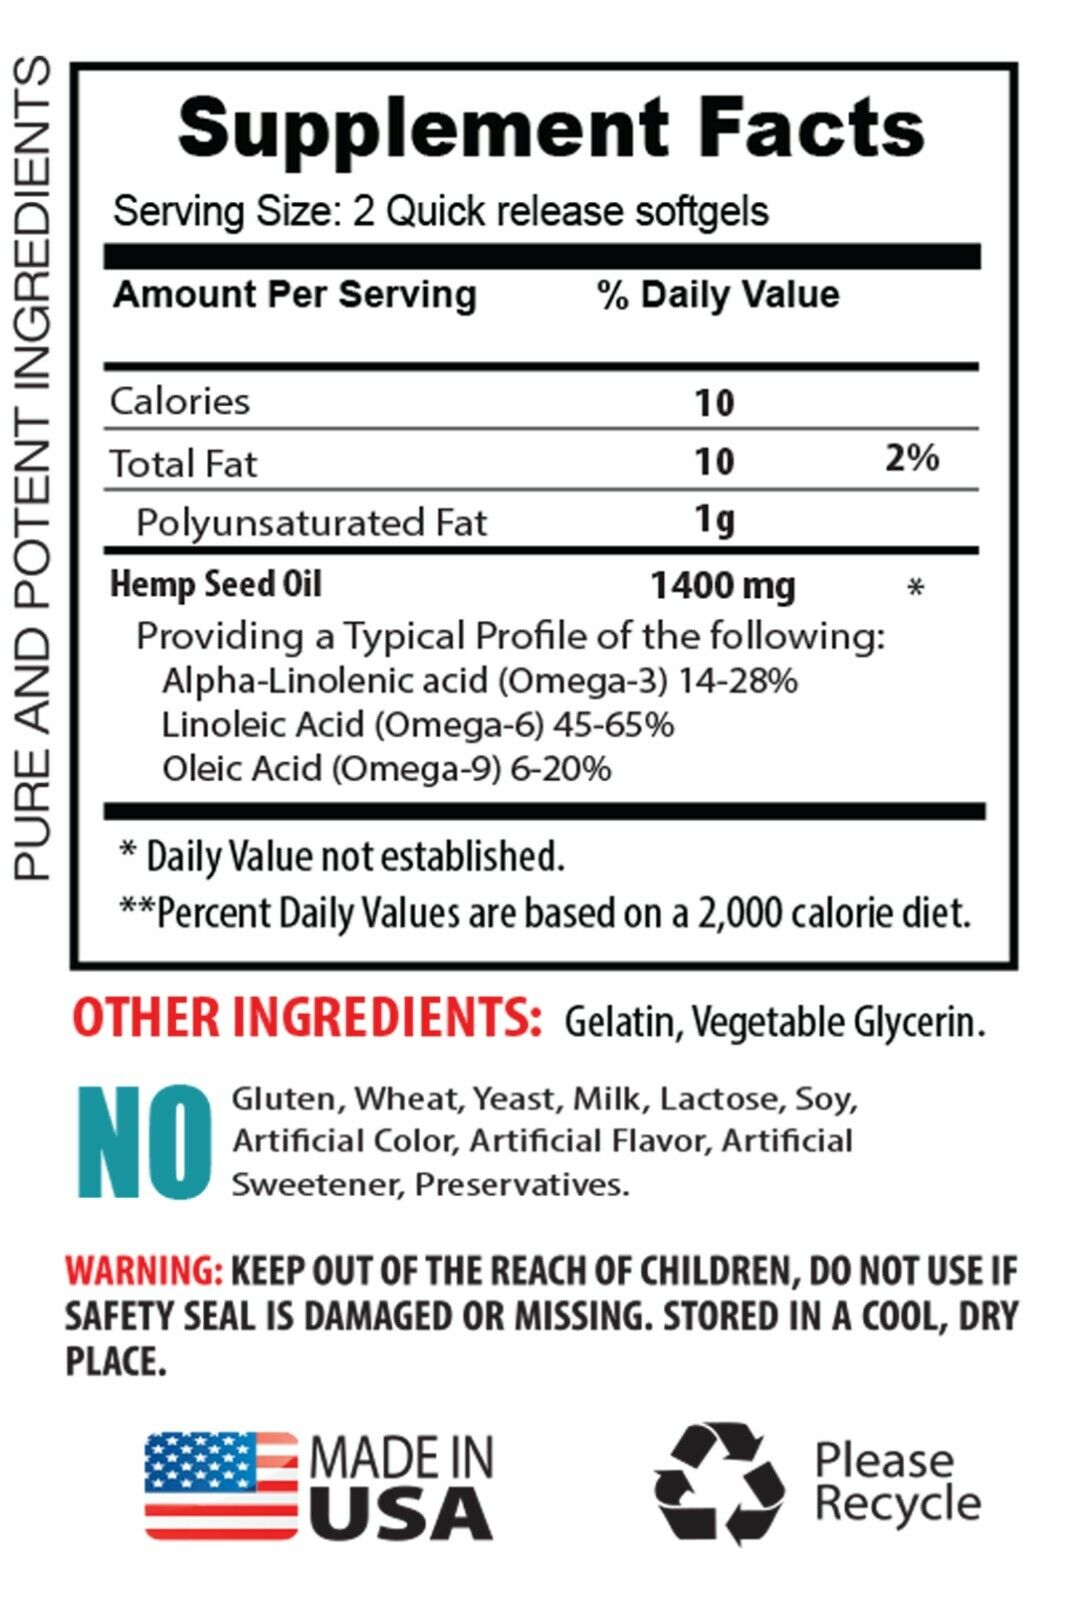 omega fatty acids, ORGANIC HEMP SEED OIL 1400mg, joint pain relief 2B 1